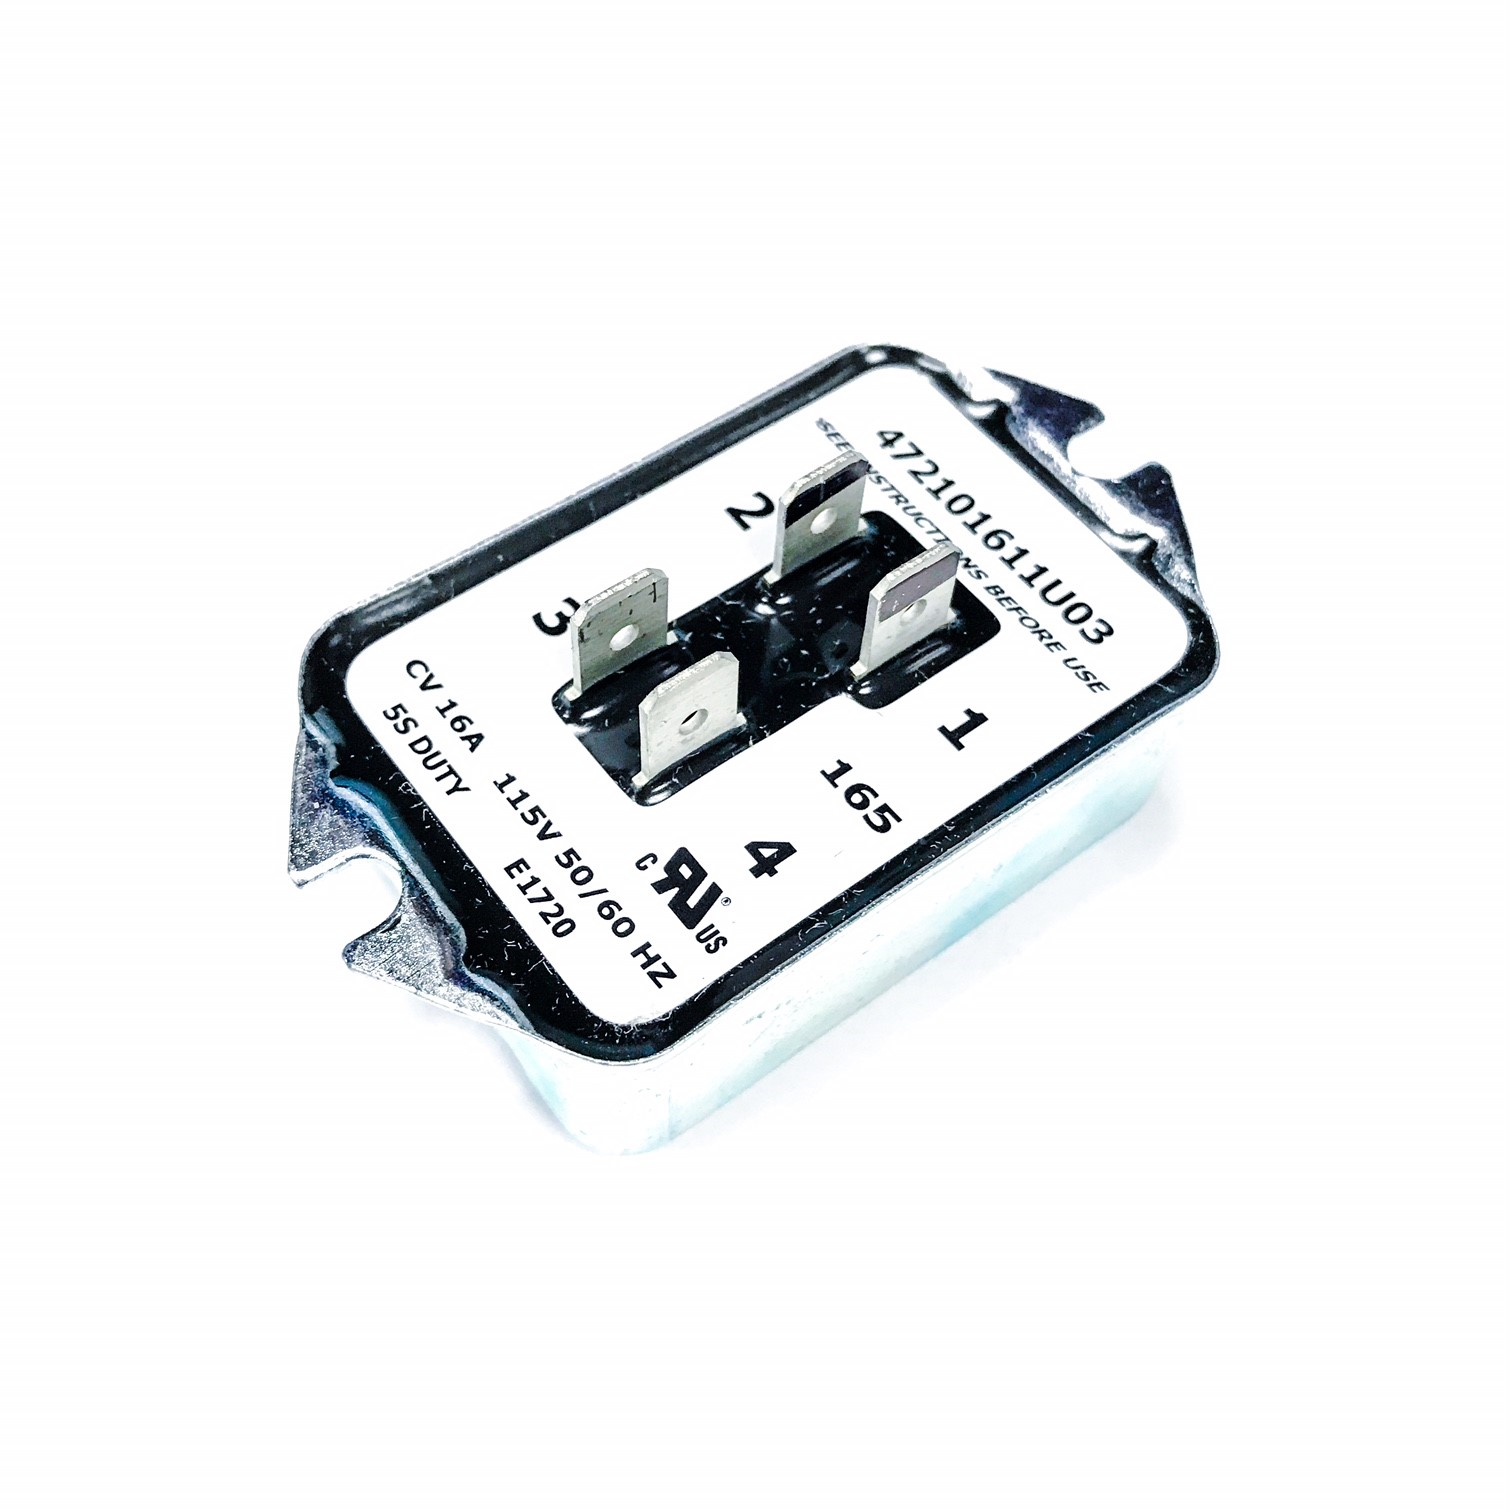 medium resolution of doc diagram salzer drum switch switches wiring reversing